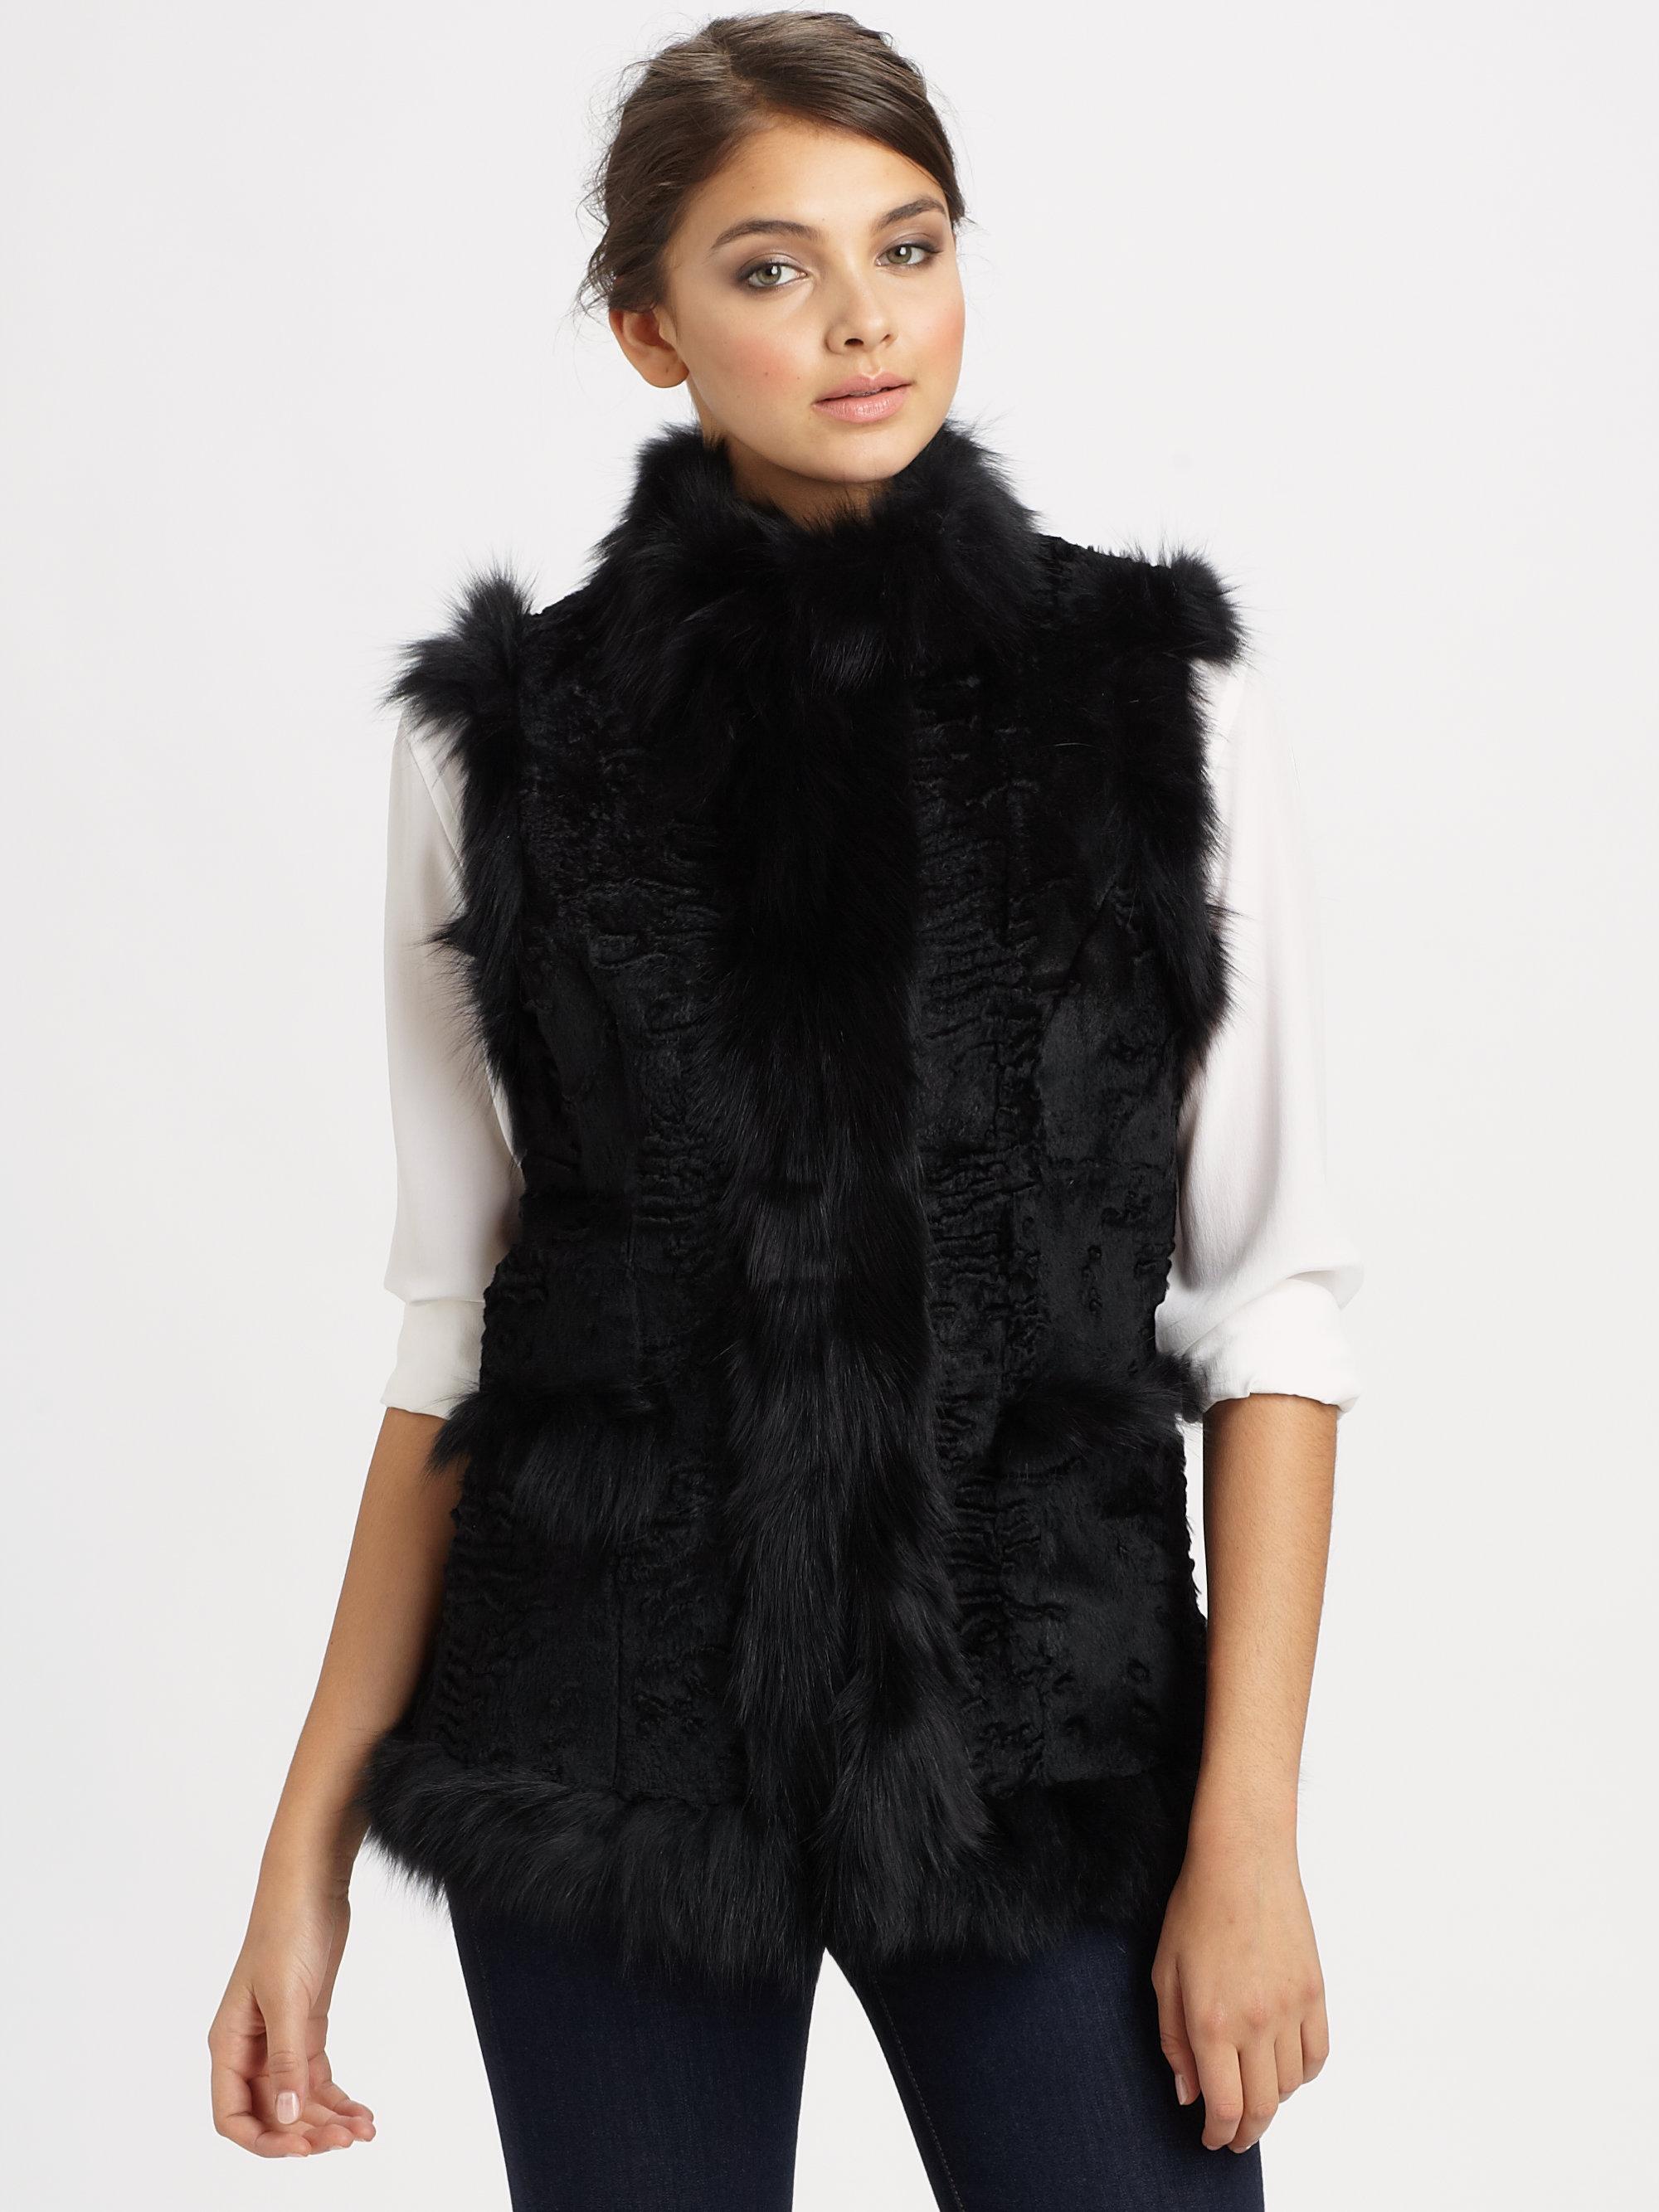 Glamourpuss Sheared Rabbit Fox Fur Vest in Black | Lyst